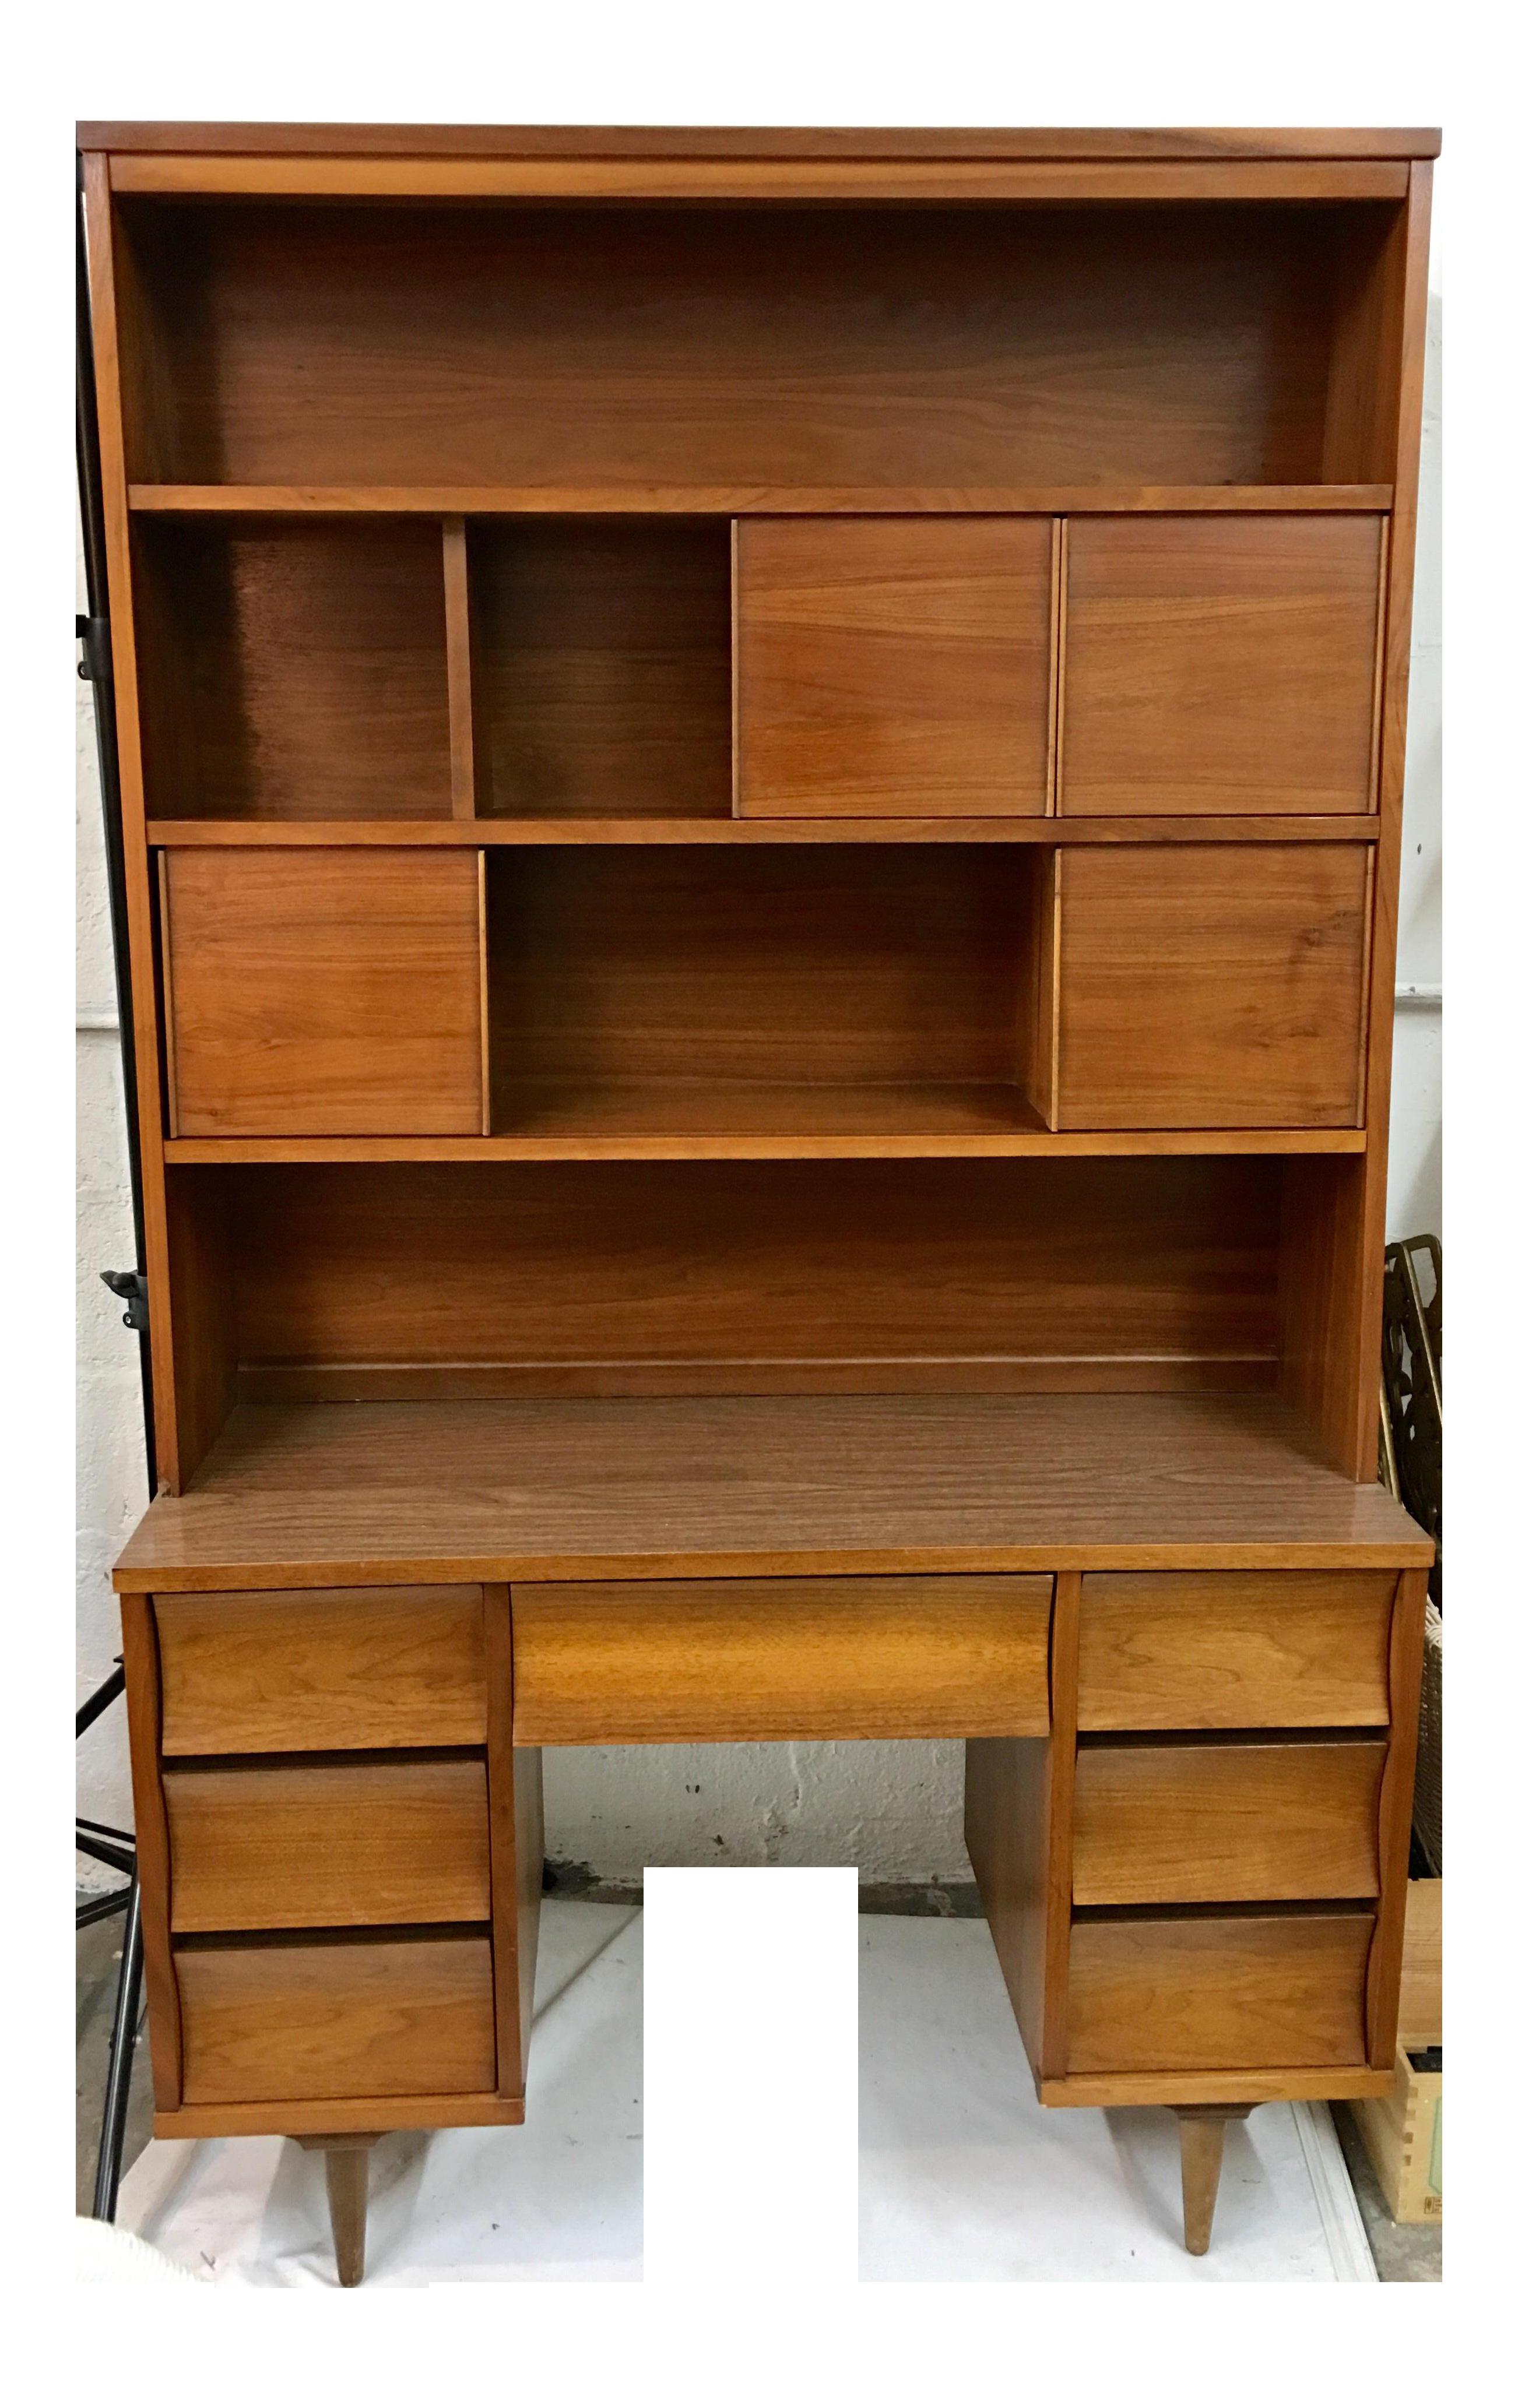 Image of: Mid Century Desk Hutch Chairish